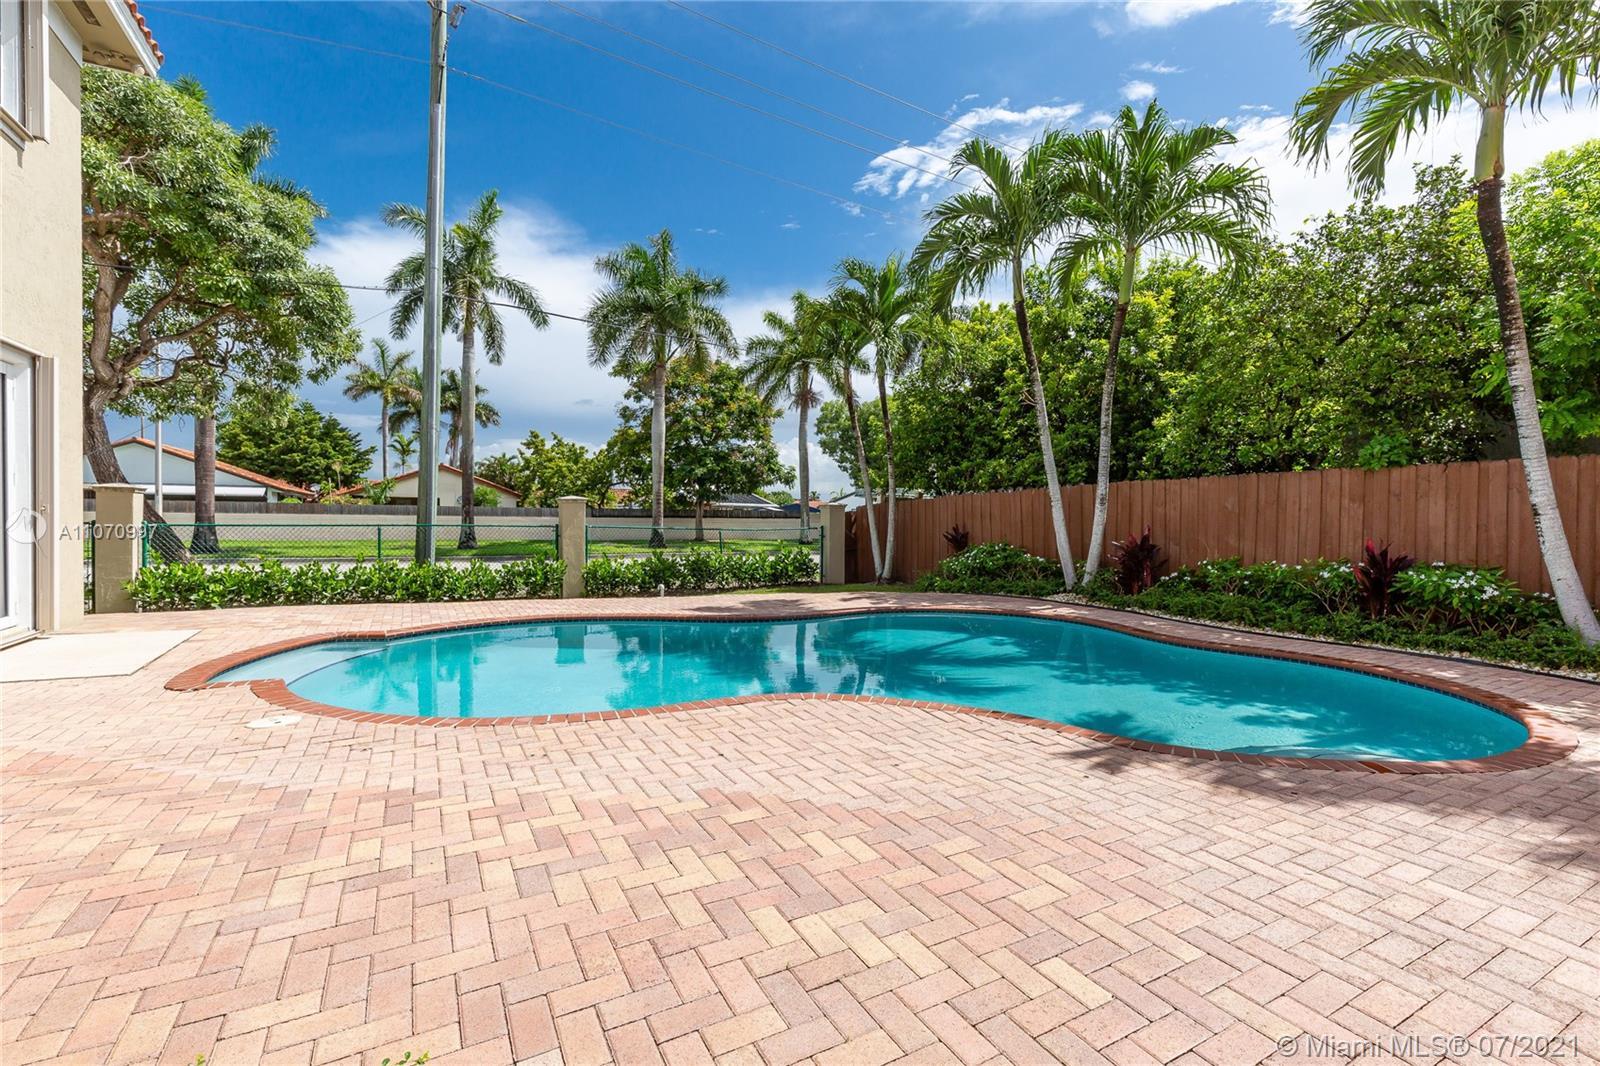 J G Heads Farms - 2601 SW 138th Path, Miami, FL 33175